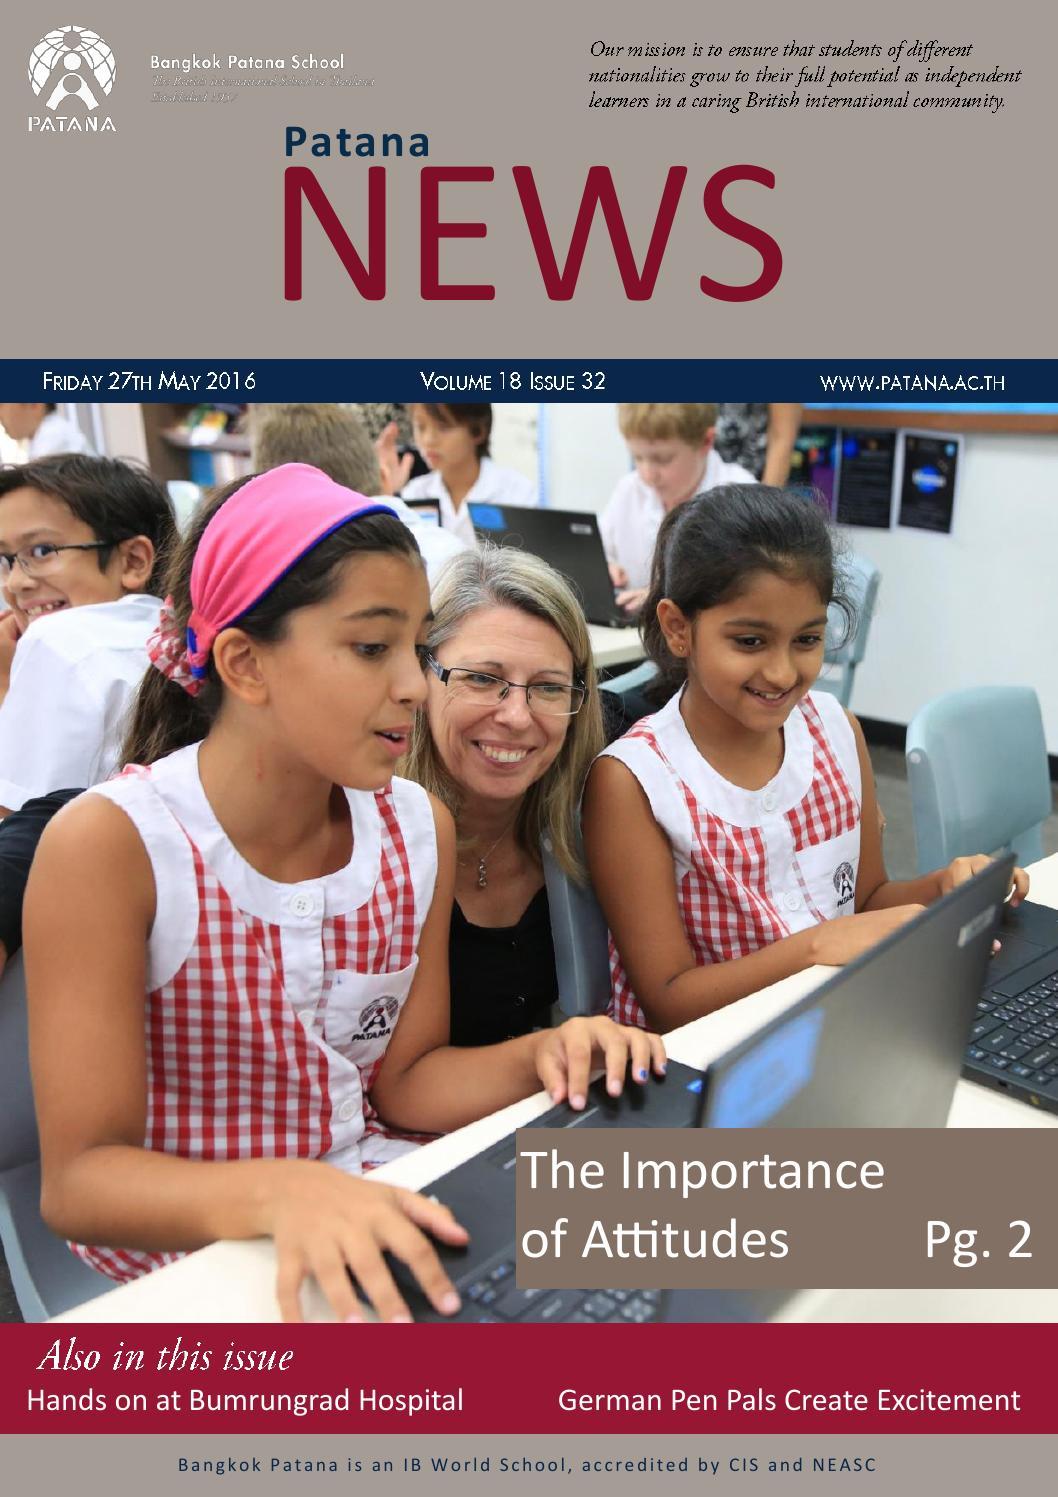 Patana News Volume 18 Issue 32 by Bangkok Patana School - issuu